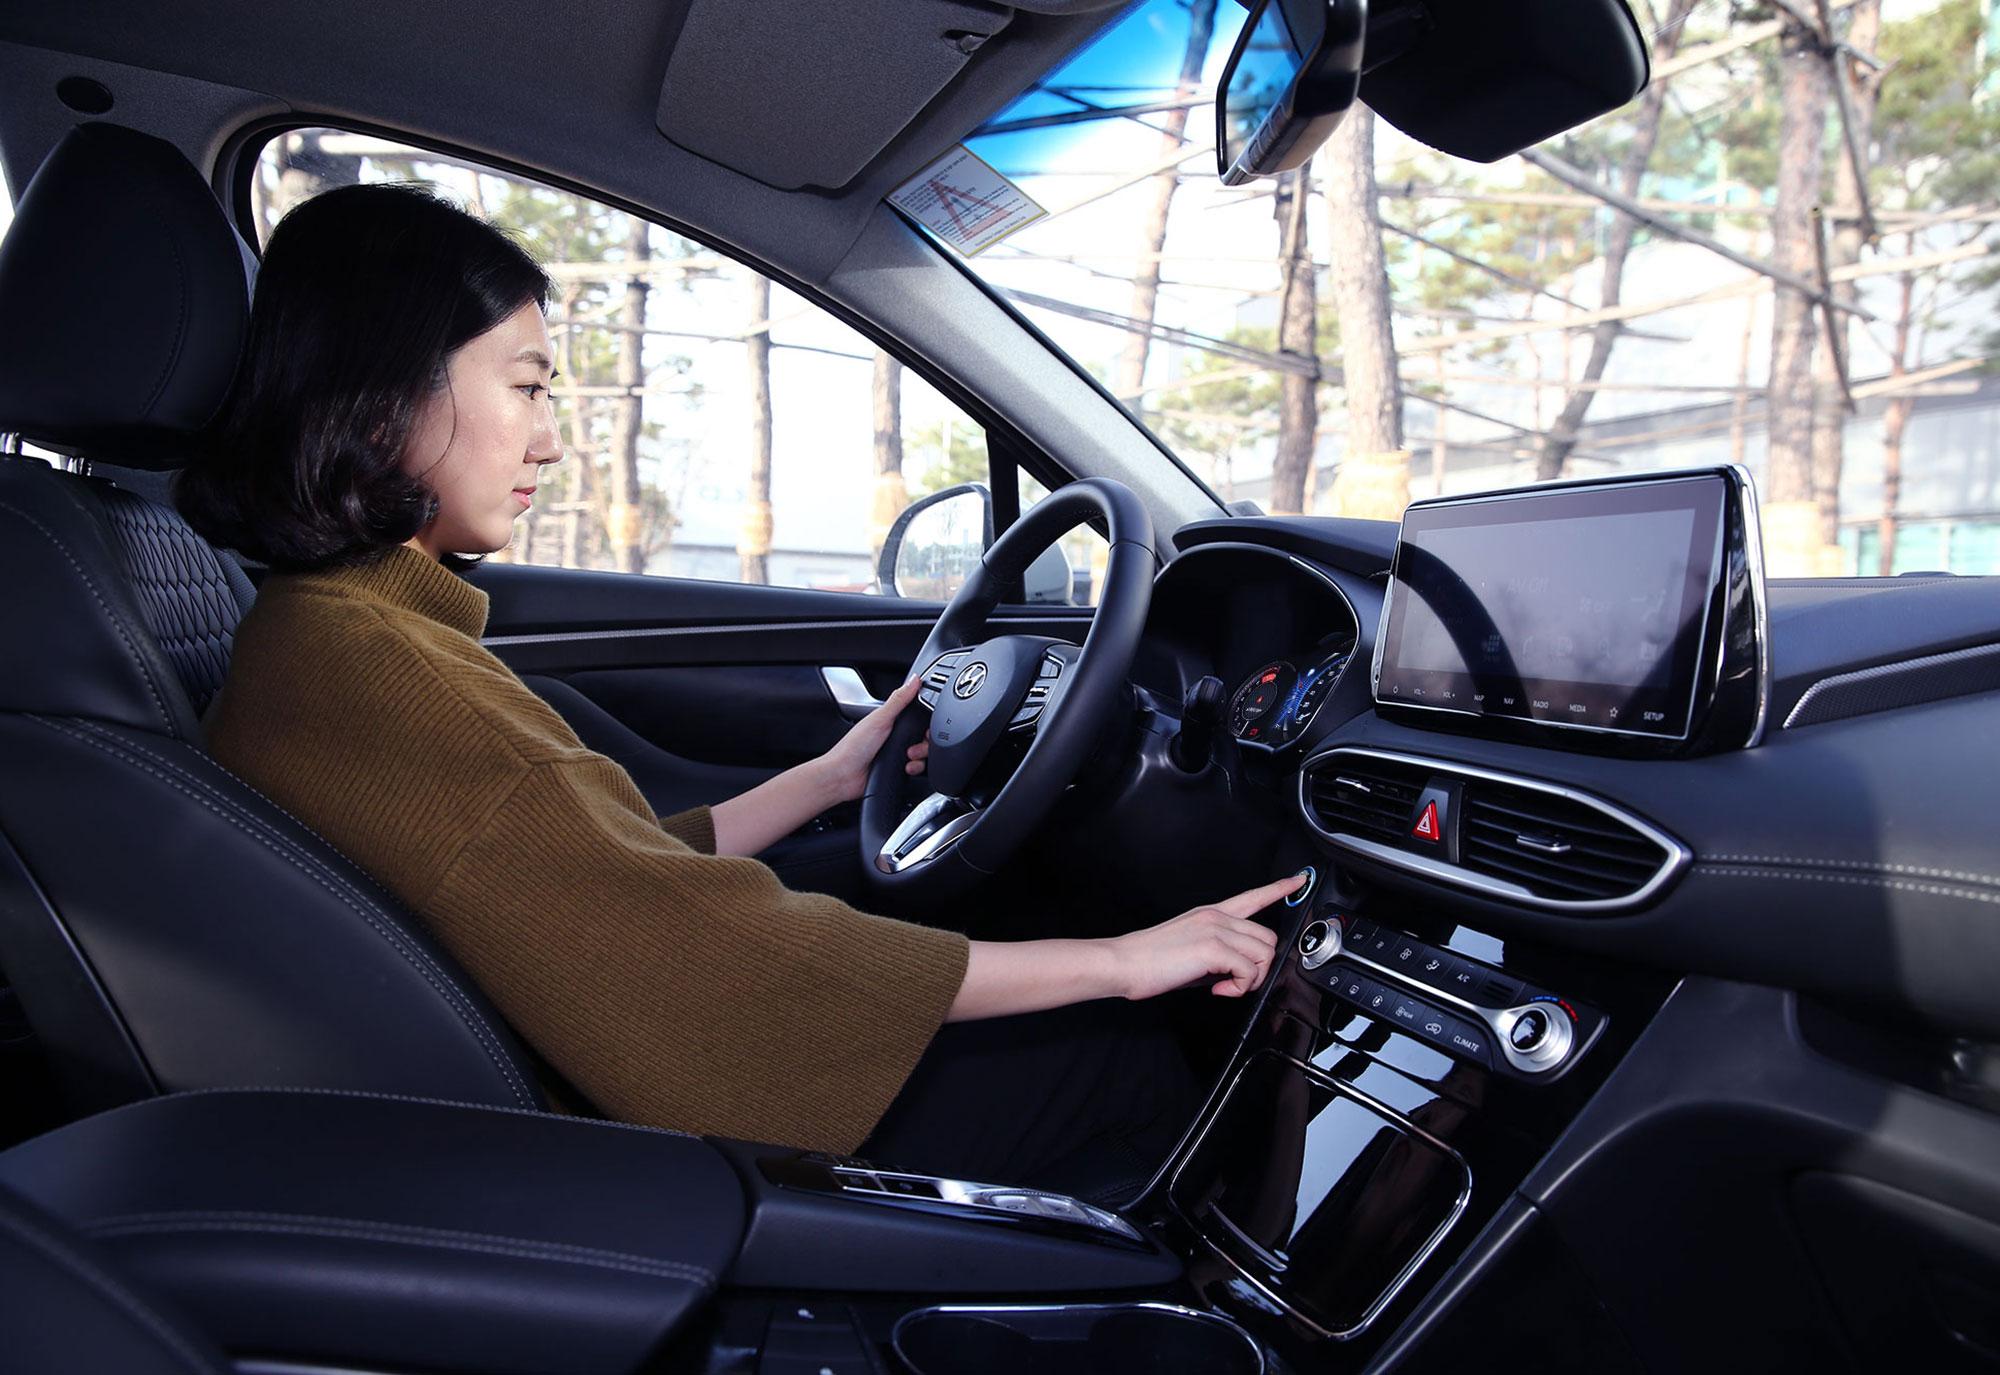 Hyundai-fingerprint-technology_press-photo3.jpg